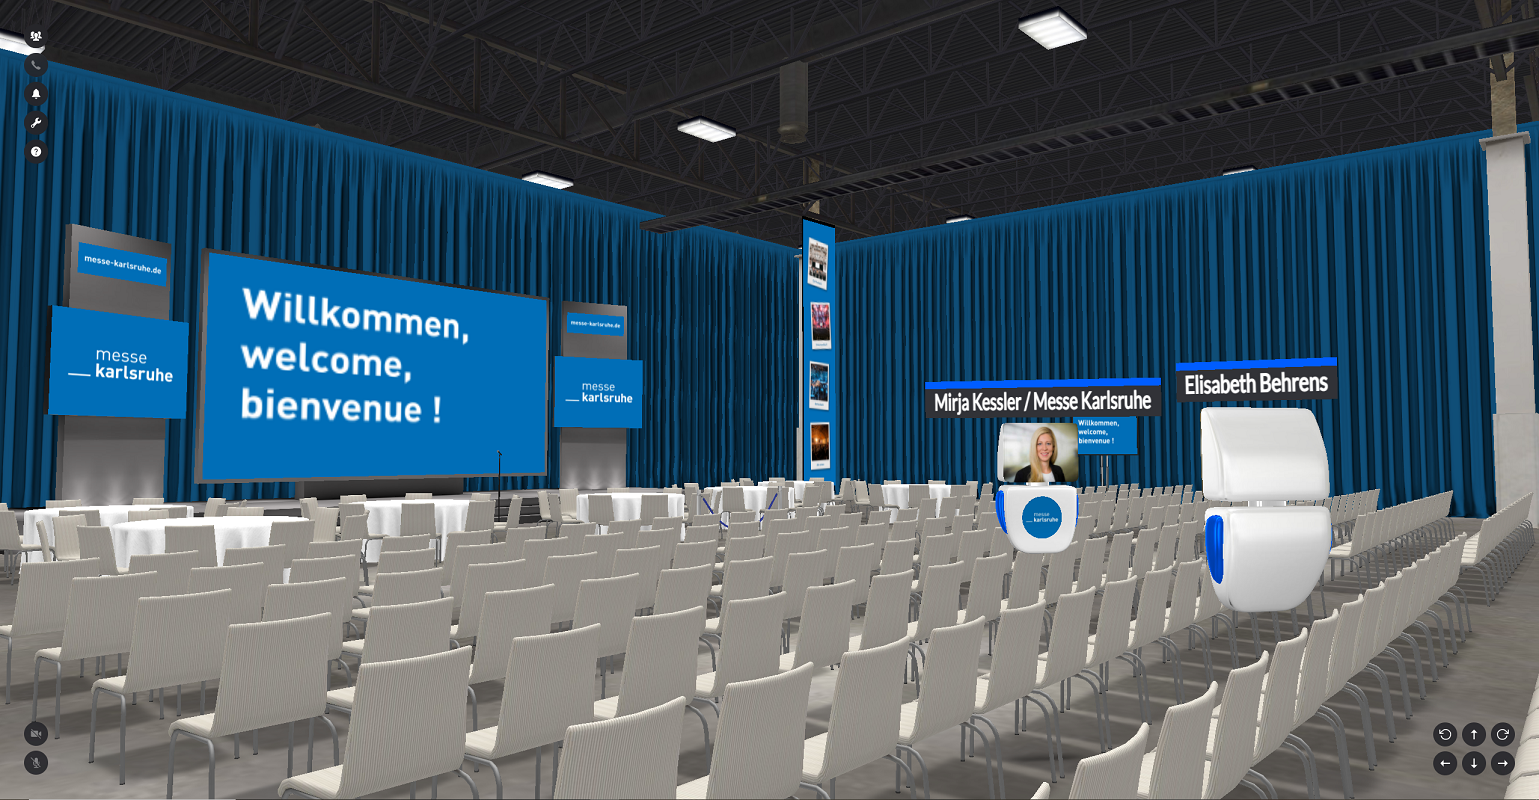 Virtuelle Gartenhalle des Kongresszentrums Karlsruhe